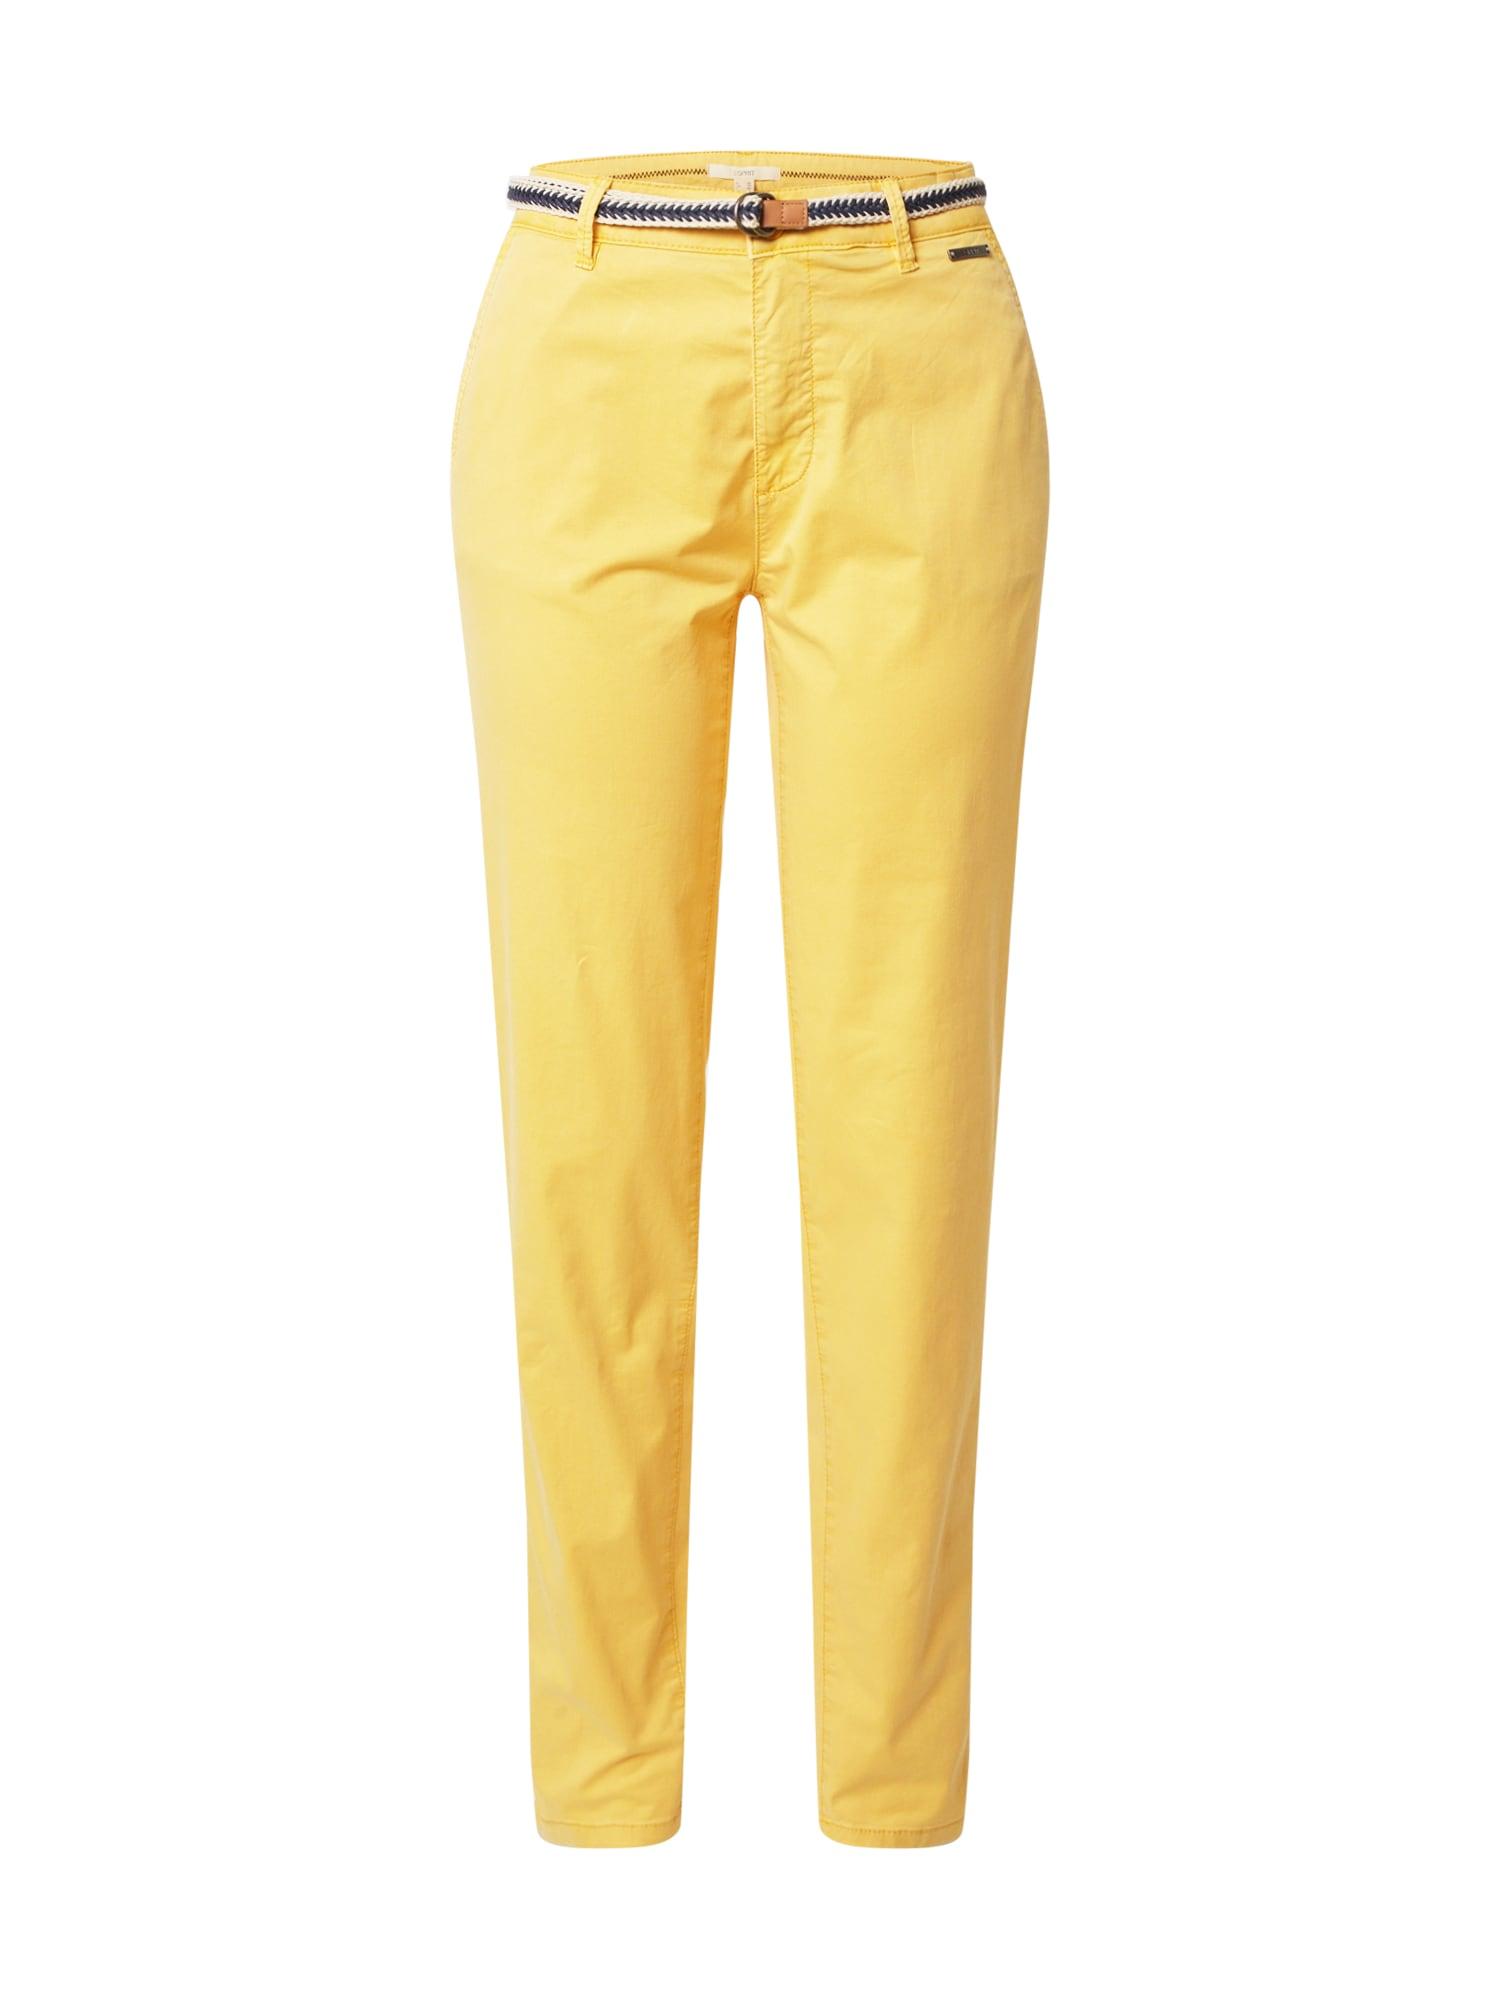 ESPRIT Chino stiliaus kelnės geltona